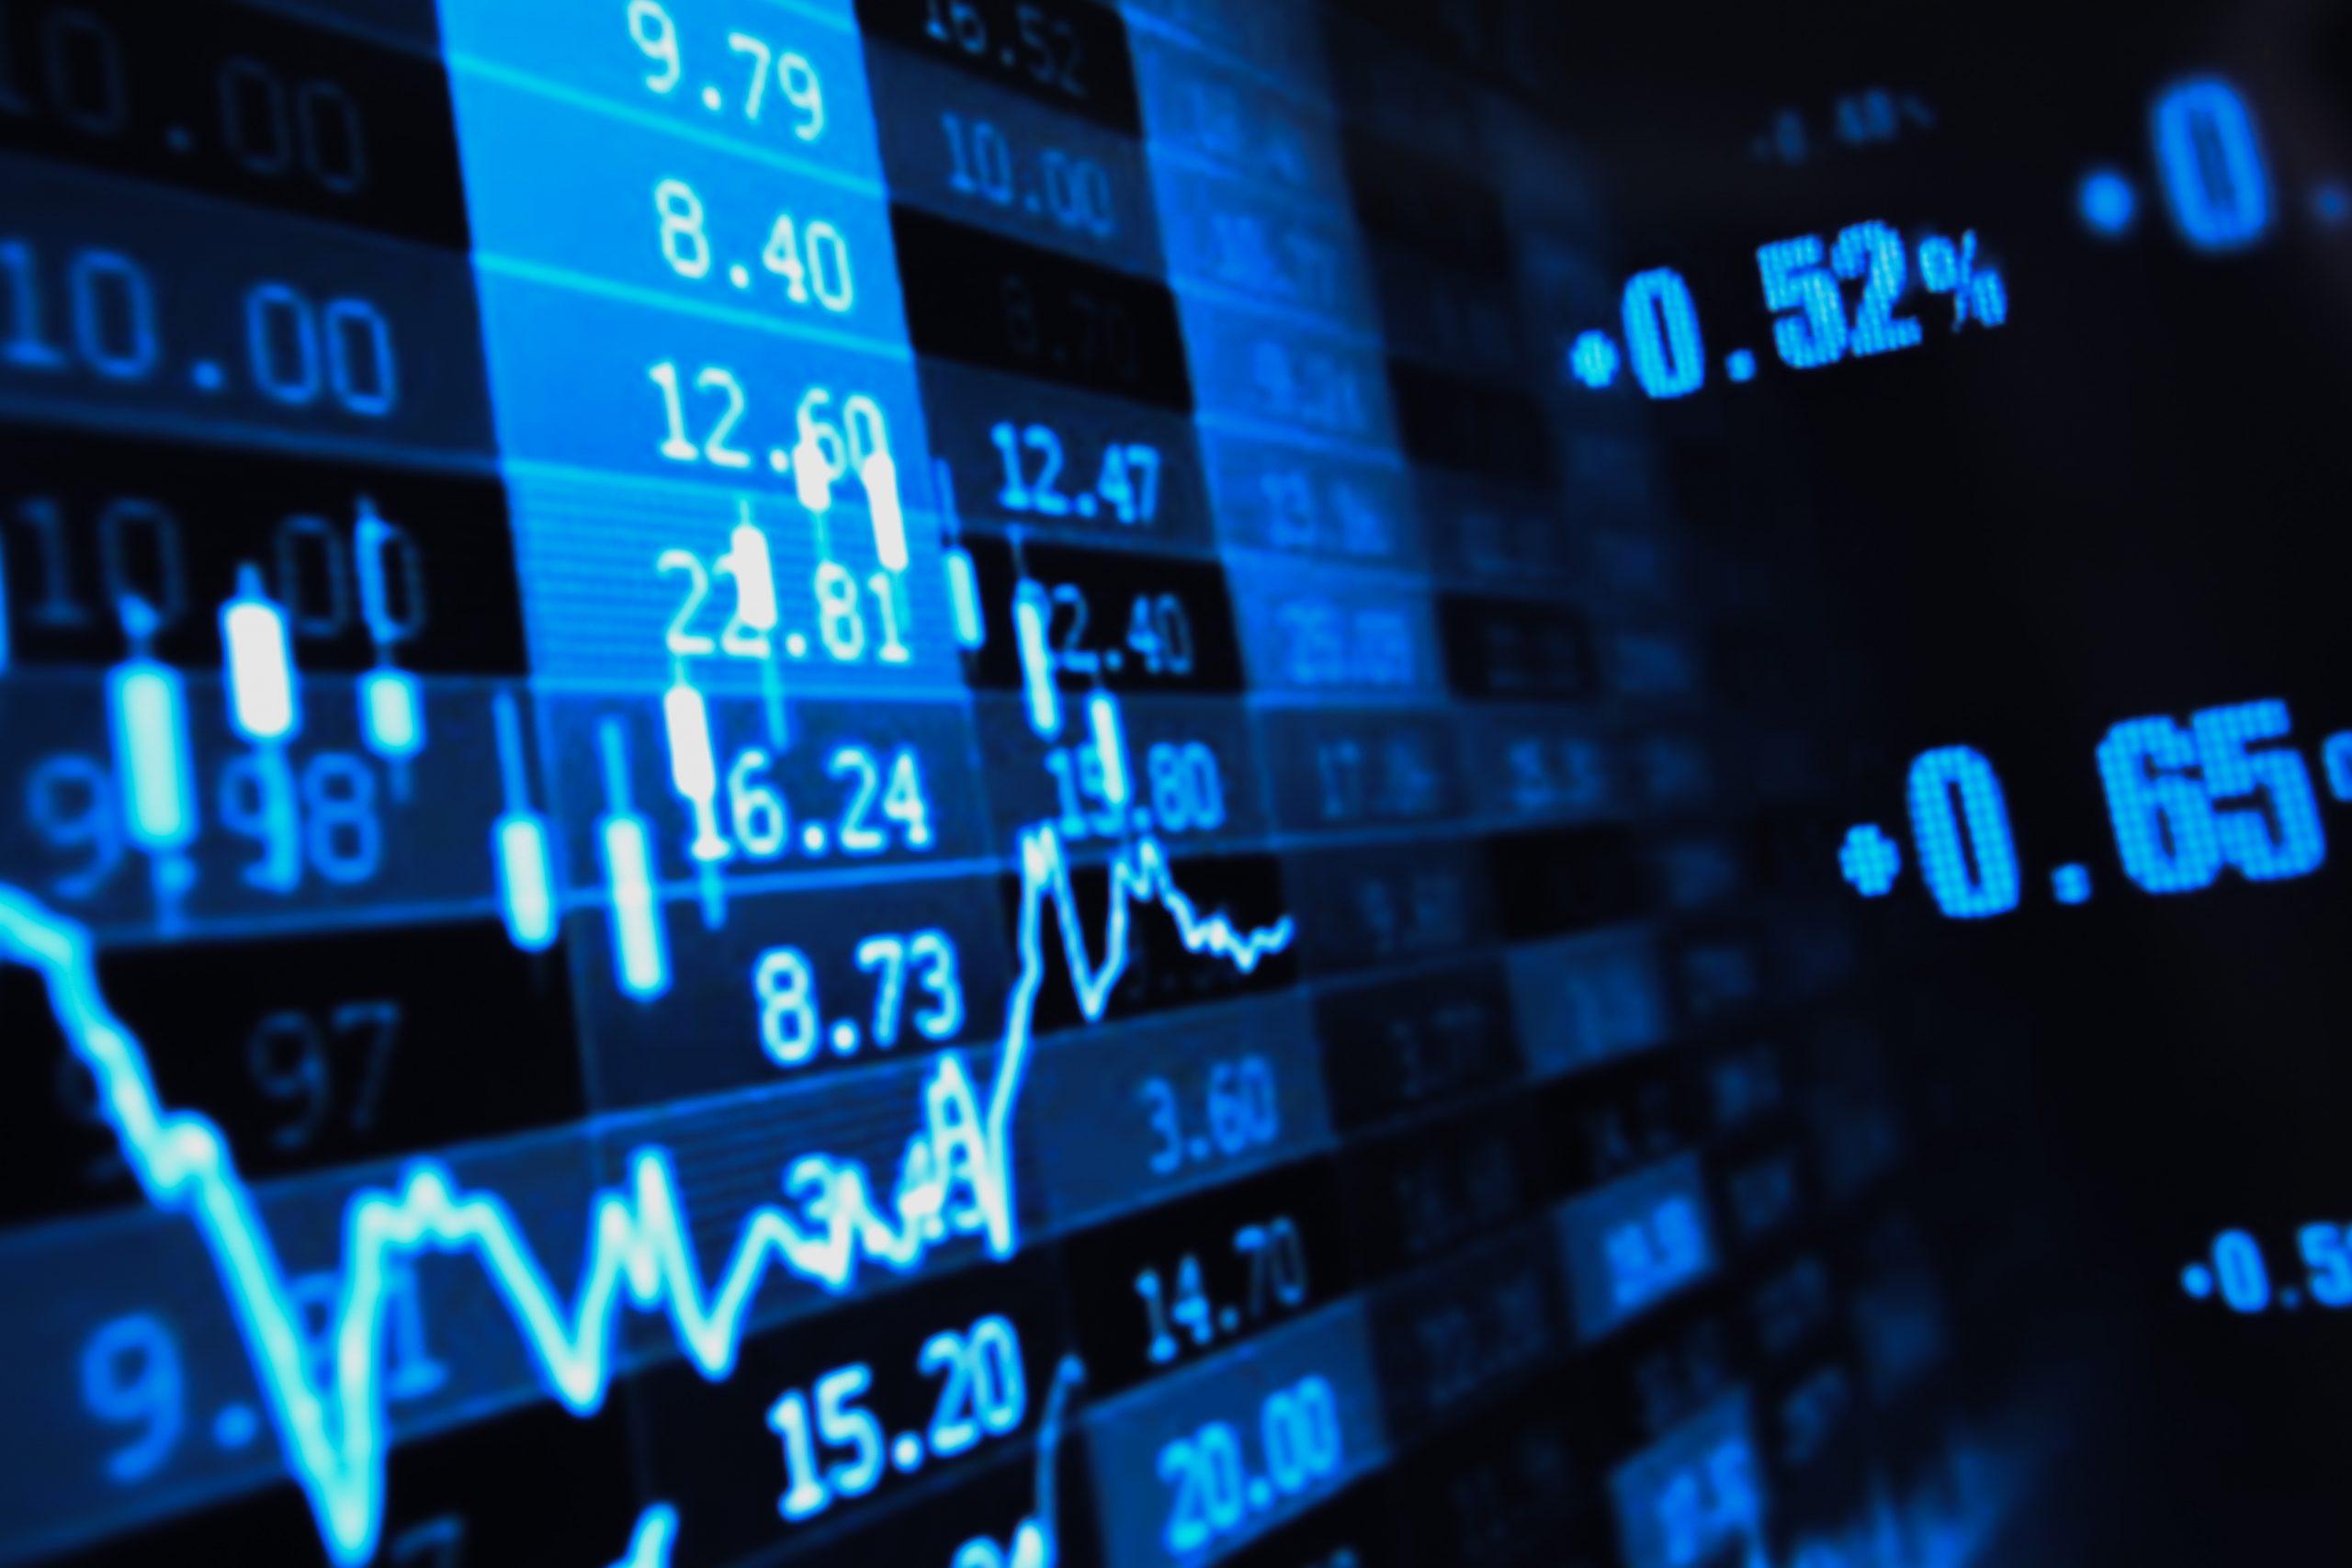 Stock market details